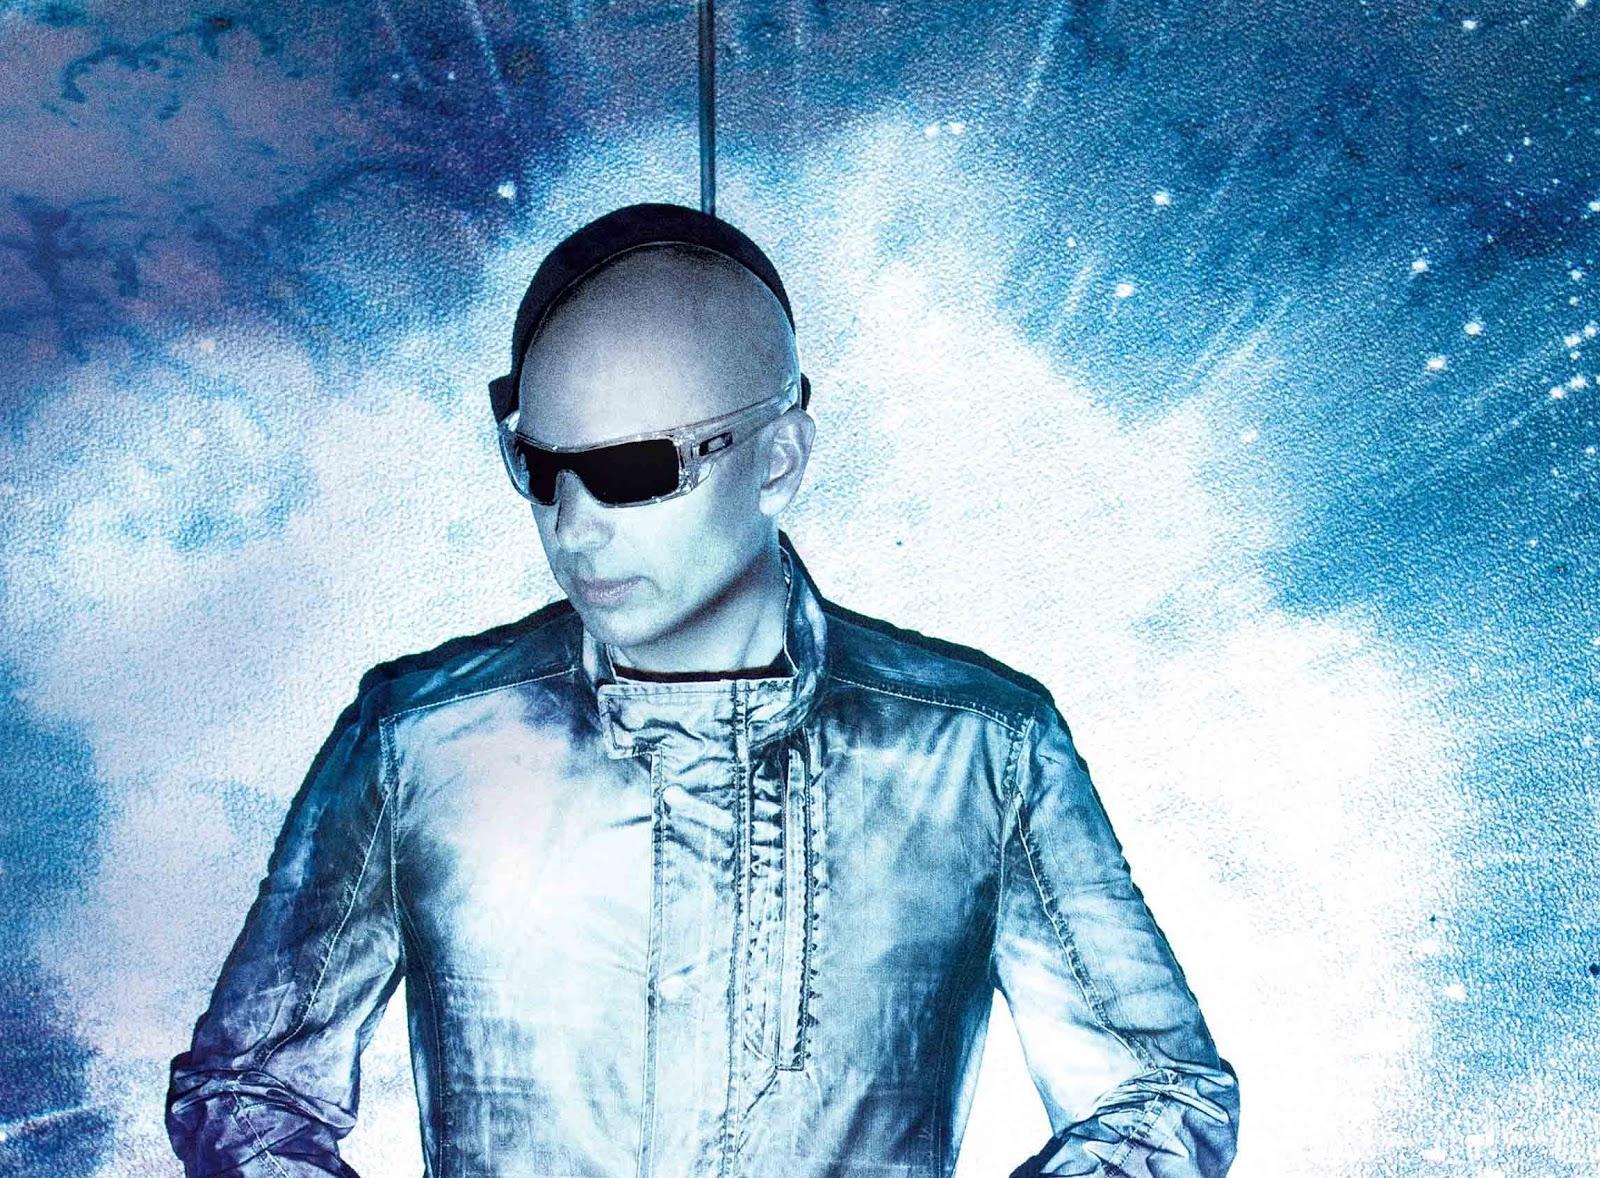 El rincon de la musica: Shockwave Supernova Joe Satriani 2015